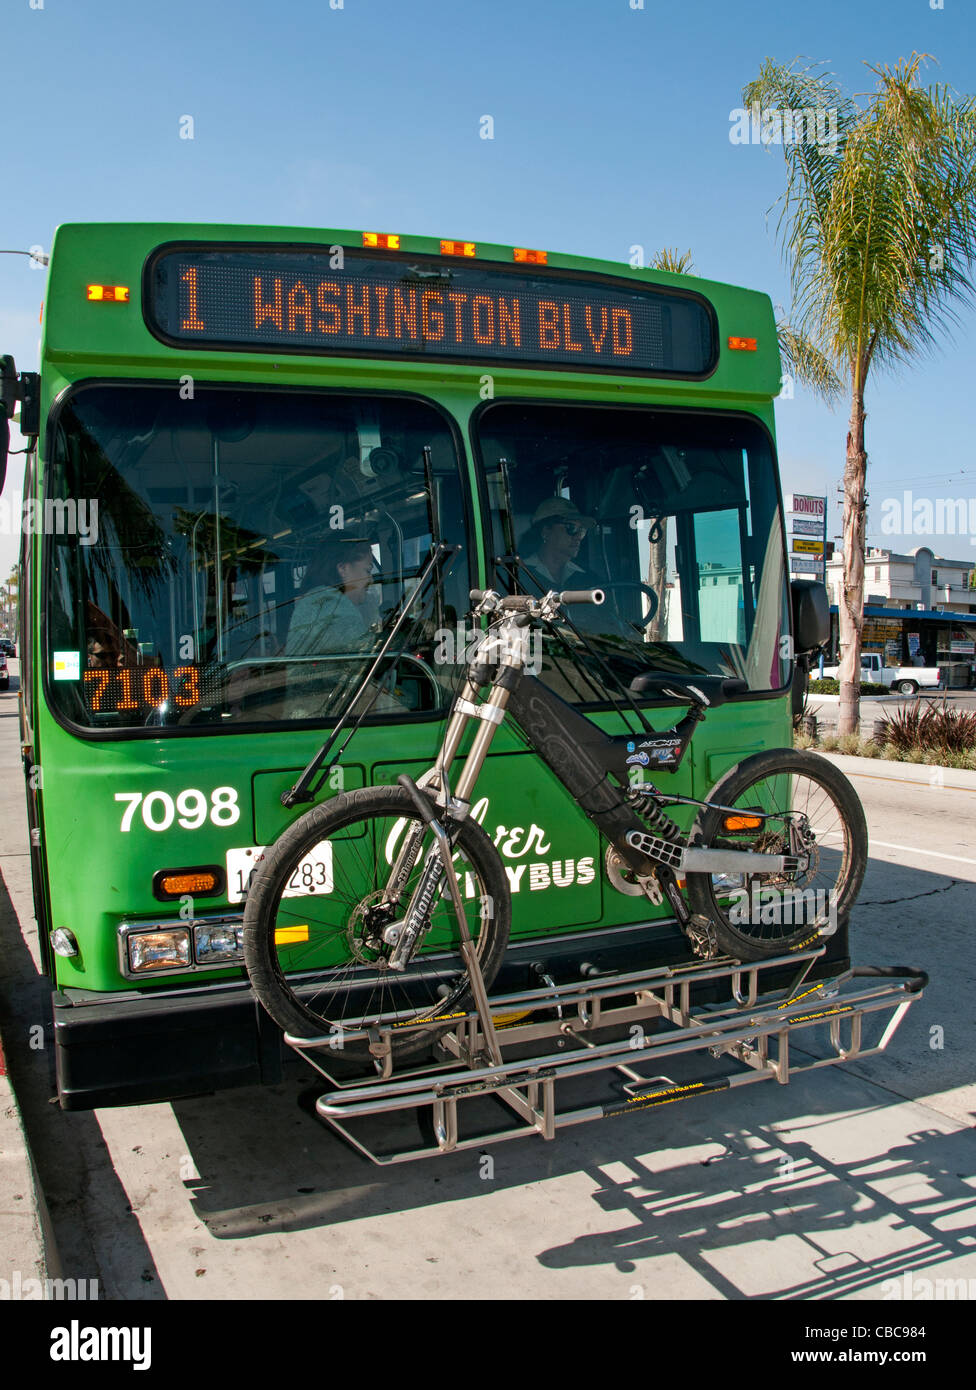 Transport bus vélo Boulevard Washington États-Unis Californie Los Angeles Photo Stock